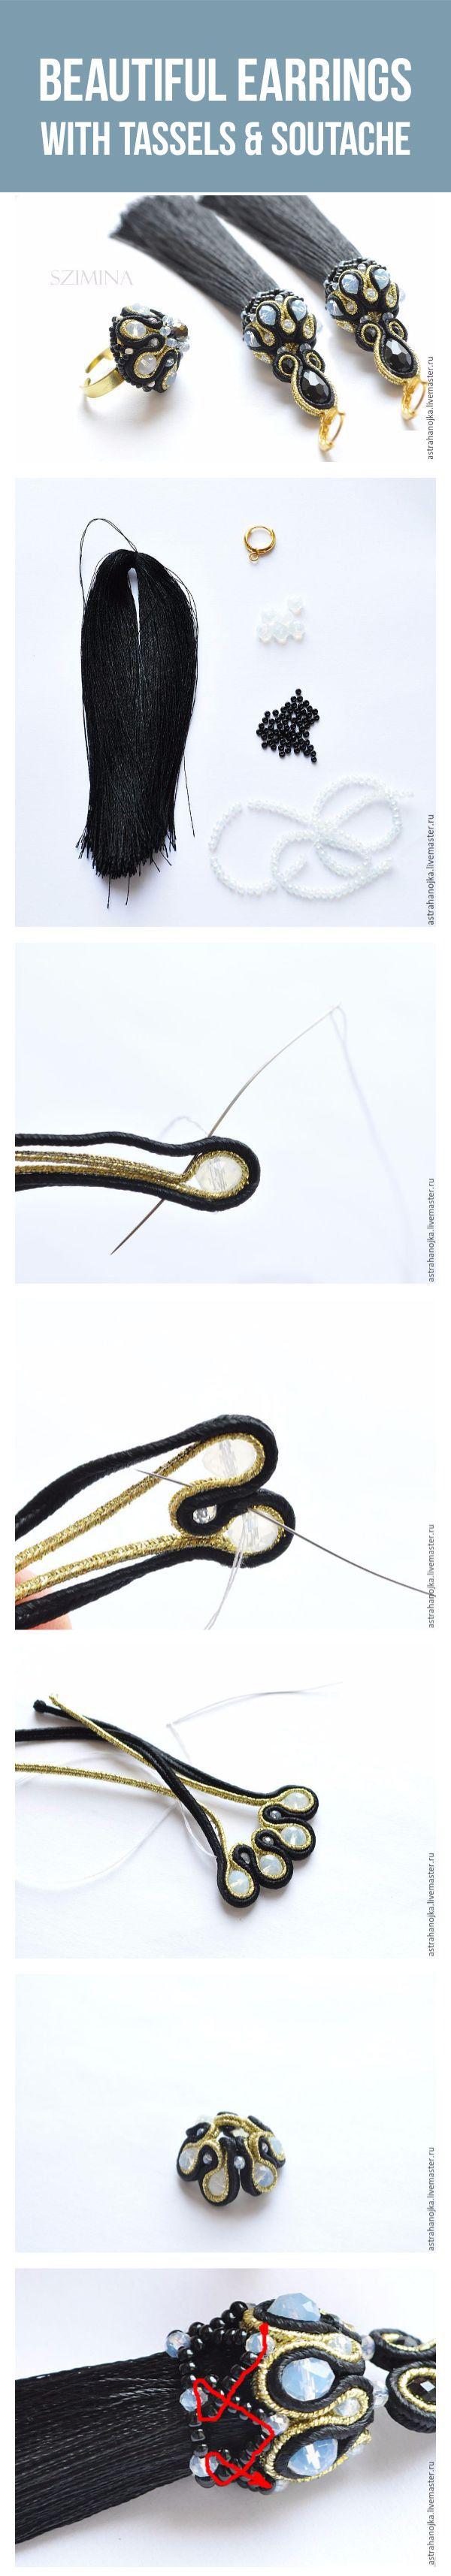 Beautiful earrings with tassels & soutache elements tutorial | Создаем серьги-кисти с объемными сутажными элементами